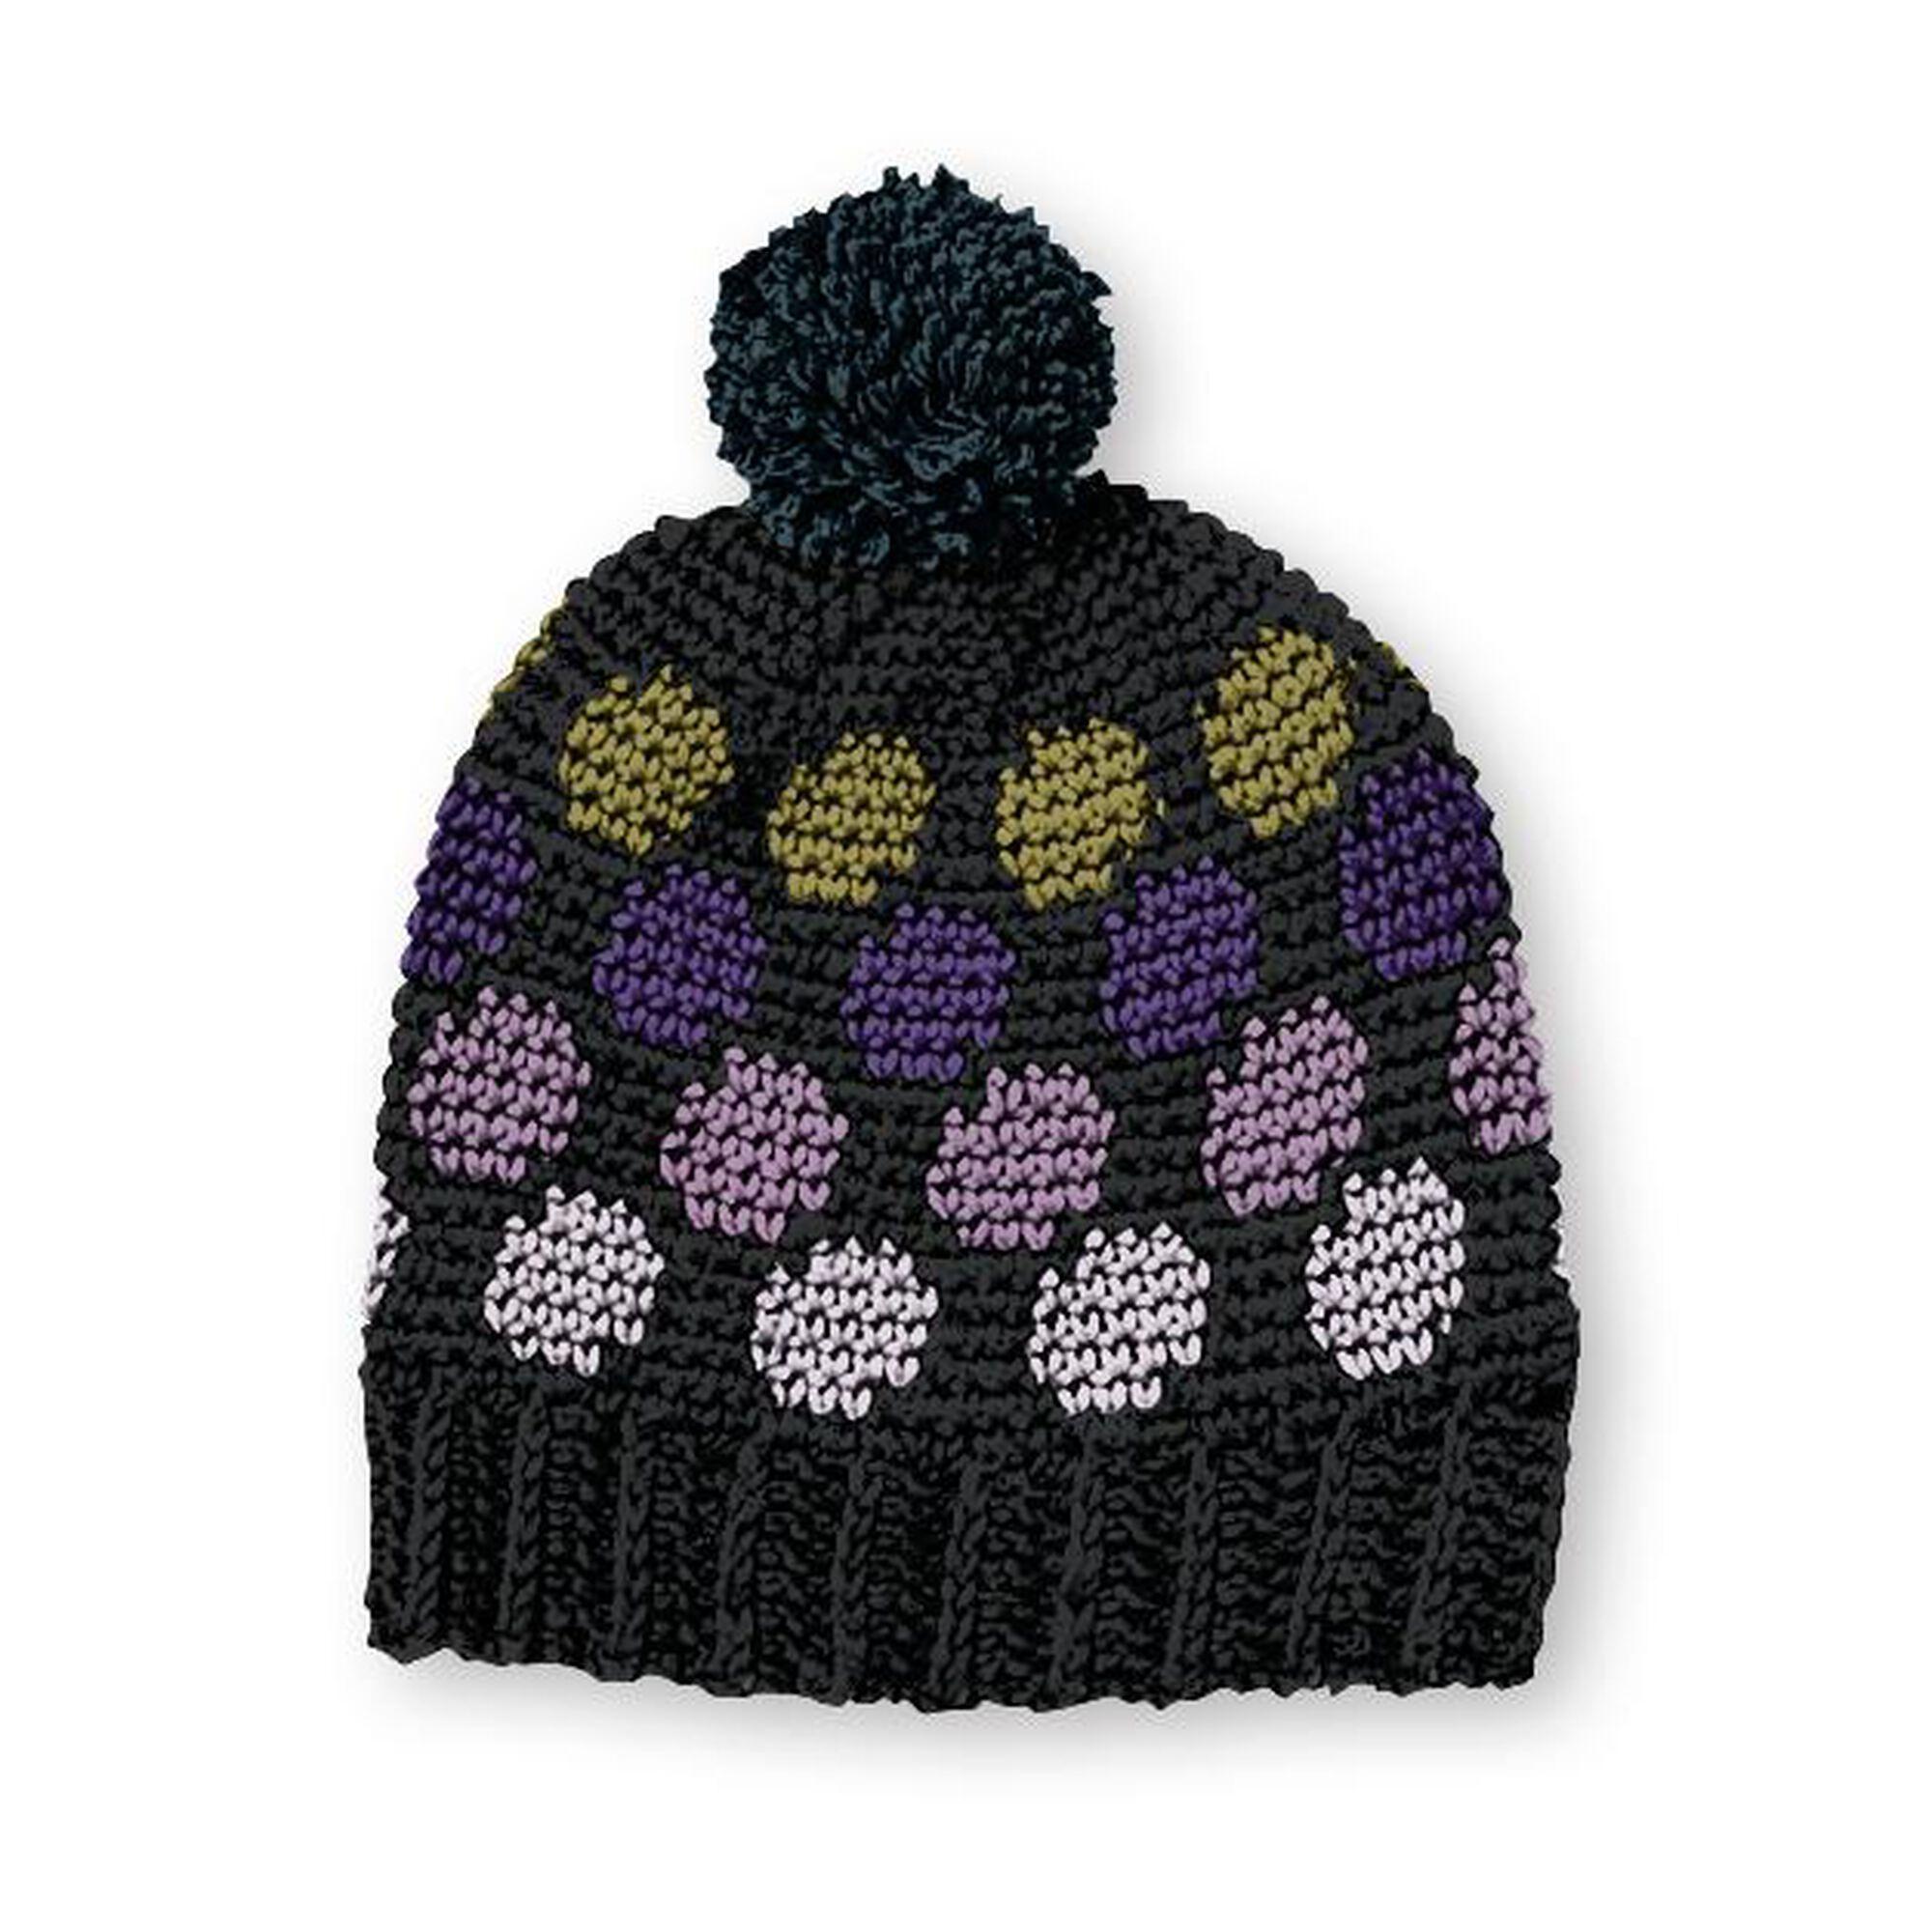 Caron X Pantone Polka Dotty Crochet Hat Pattern Yarnspirations